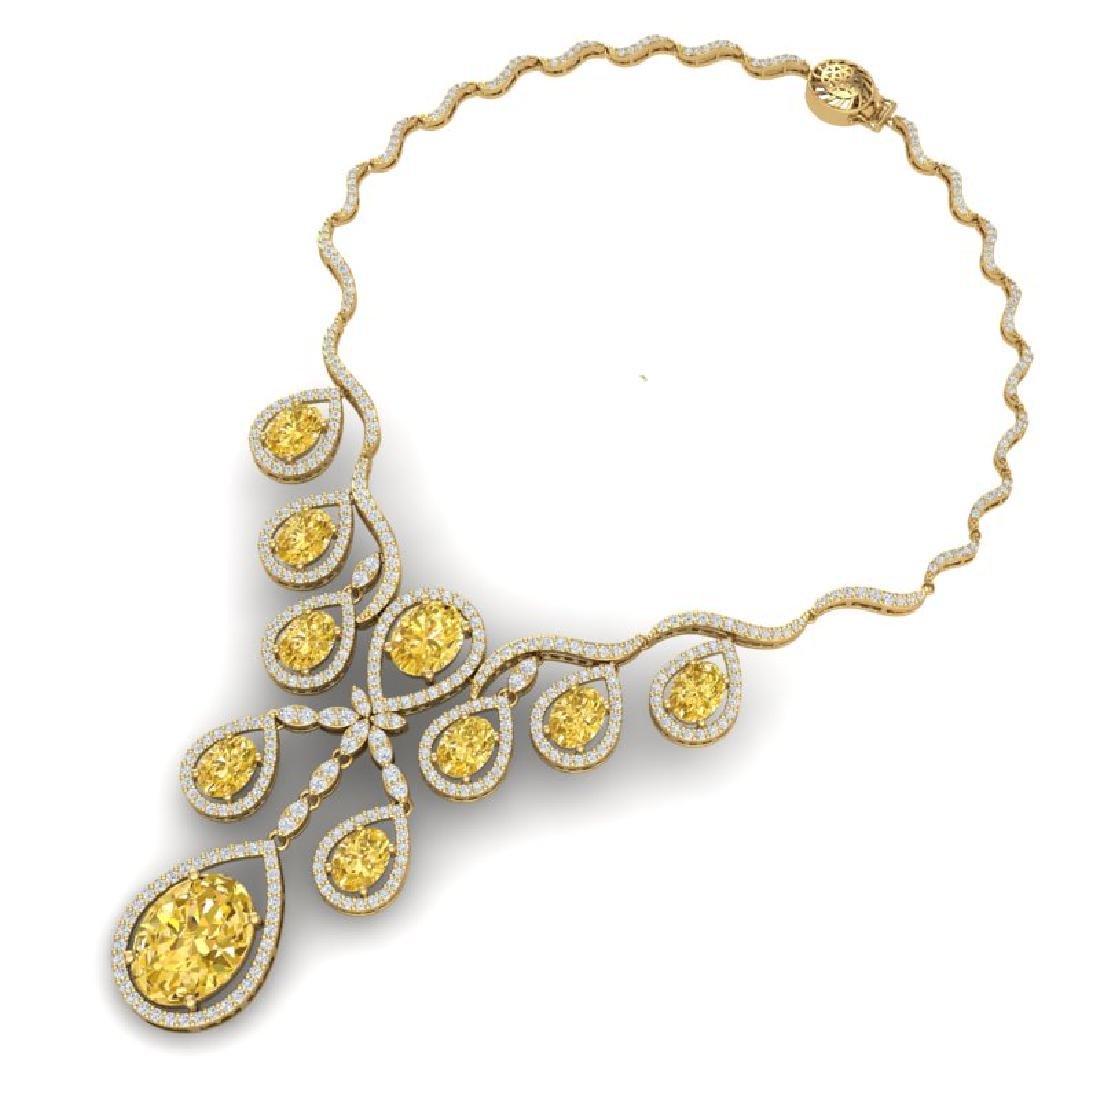 36.51 CTW Royalty Canary Citrine & VS Diamond Necklace - 3